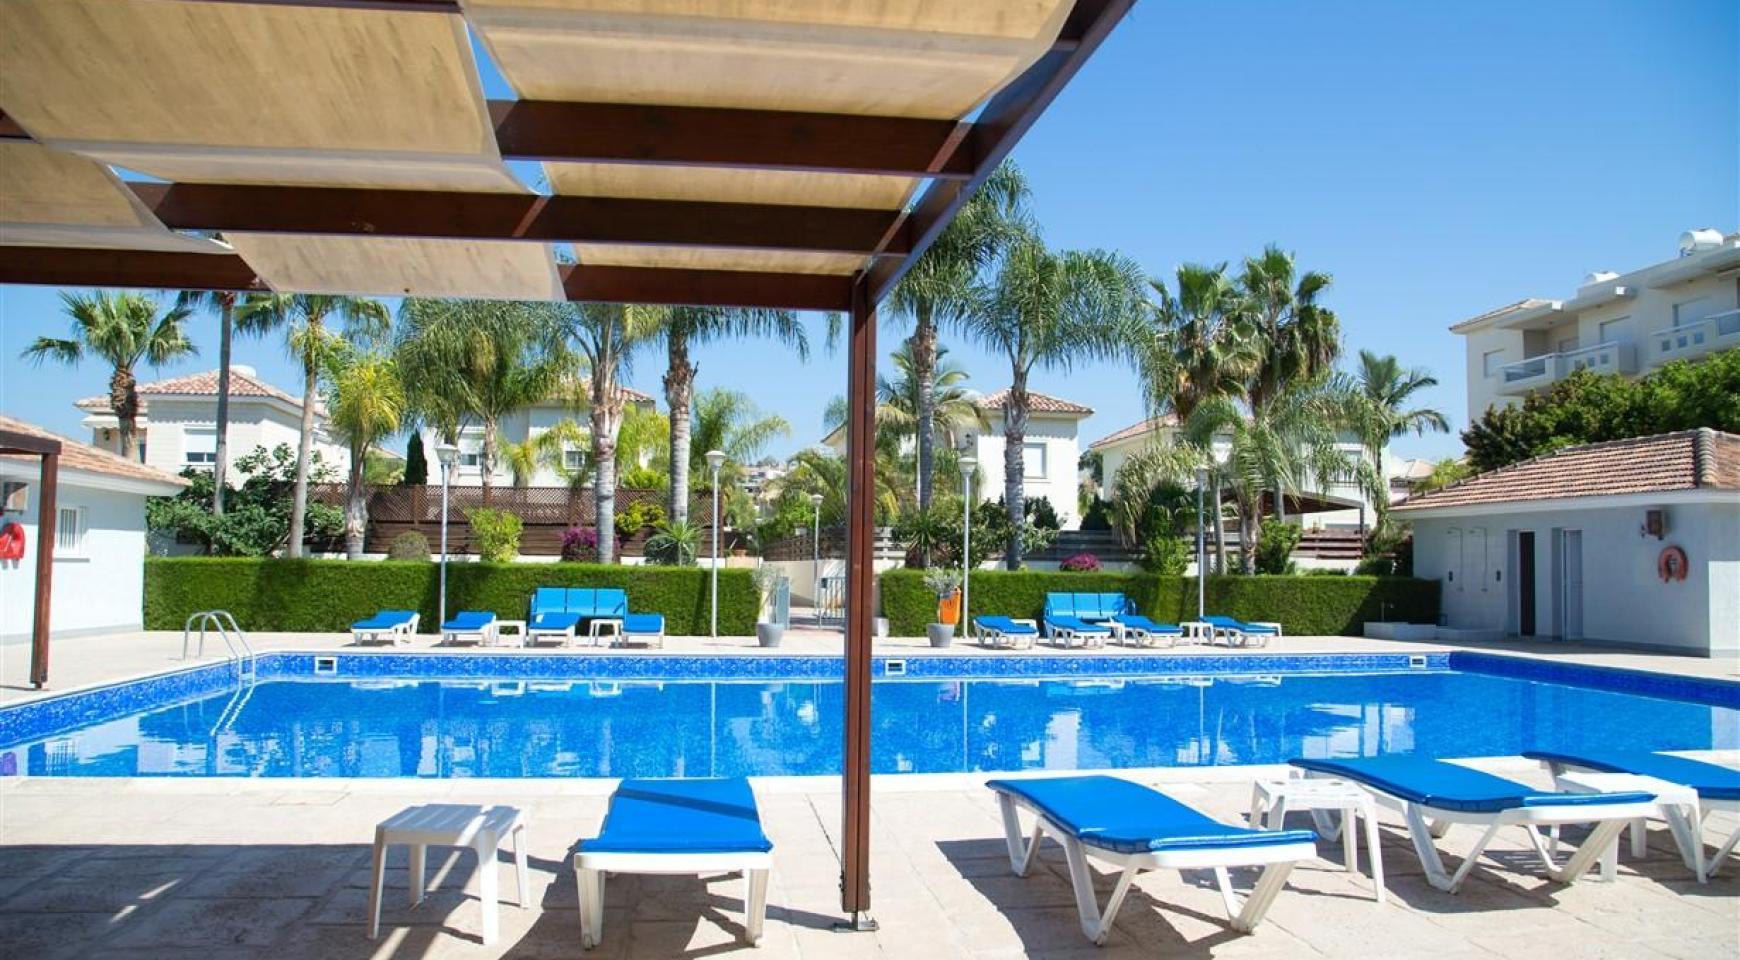 Luxury 2 Bedroom Apartment Mesogios Iris 304 in the Tourist area near the Beach - 31